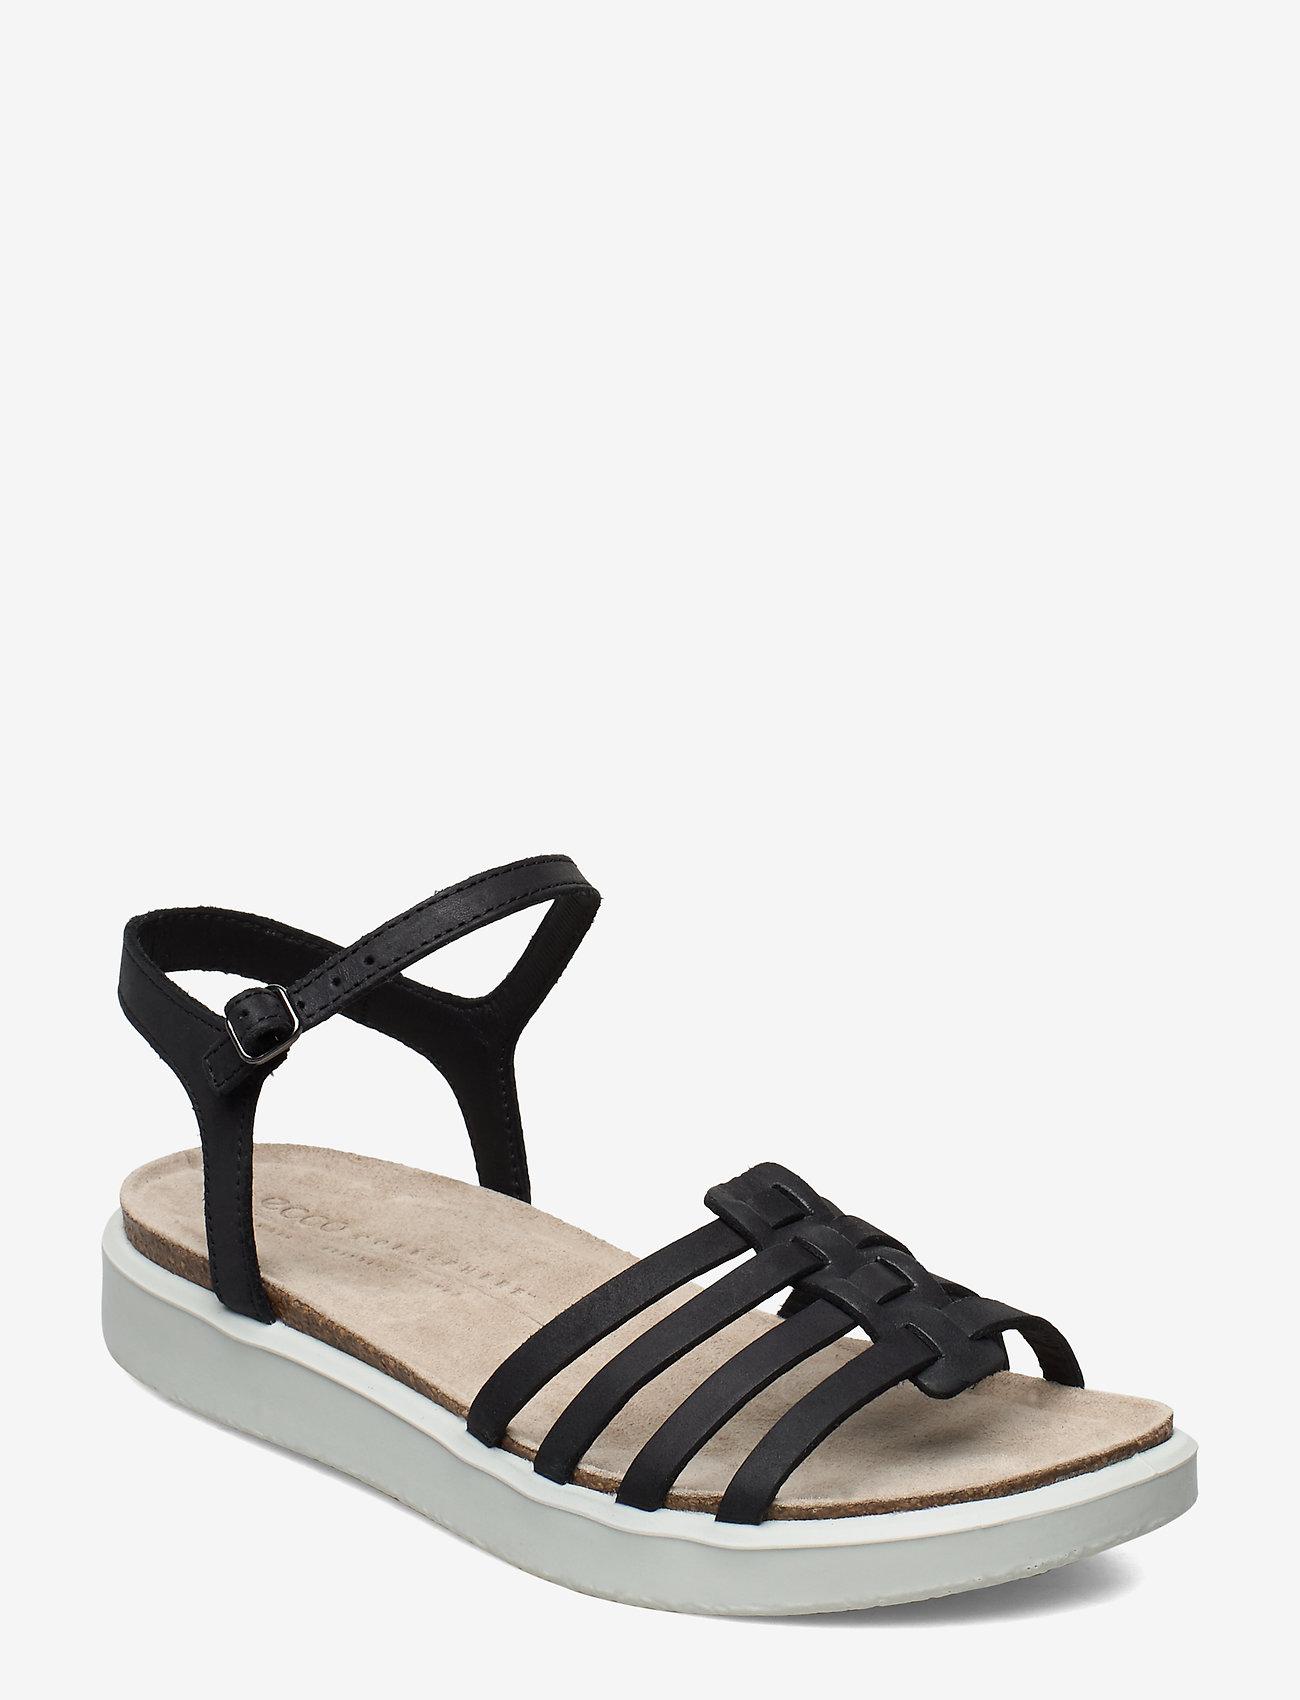 ECCO - CORKSPHERE SANDAL - flat sandals - black - 0